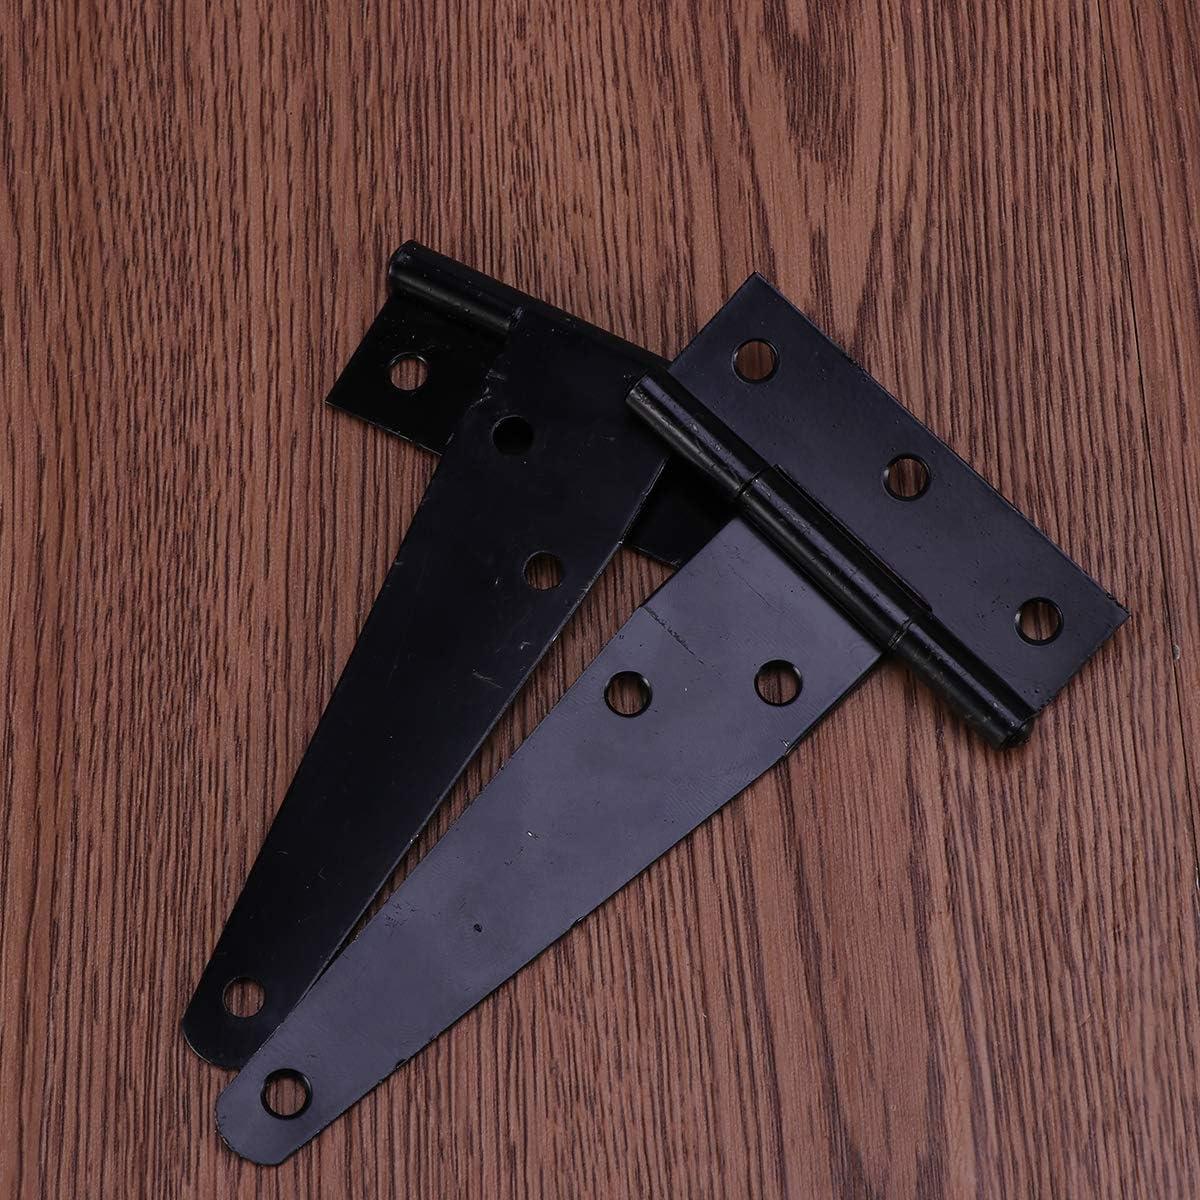 Black Yardwe 6PCS 4 inch T-Strap shed Hinge gate Strap Light Duty gate Strap Hinge Door gate Hinges